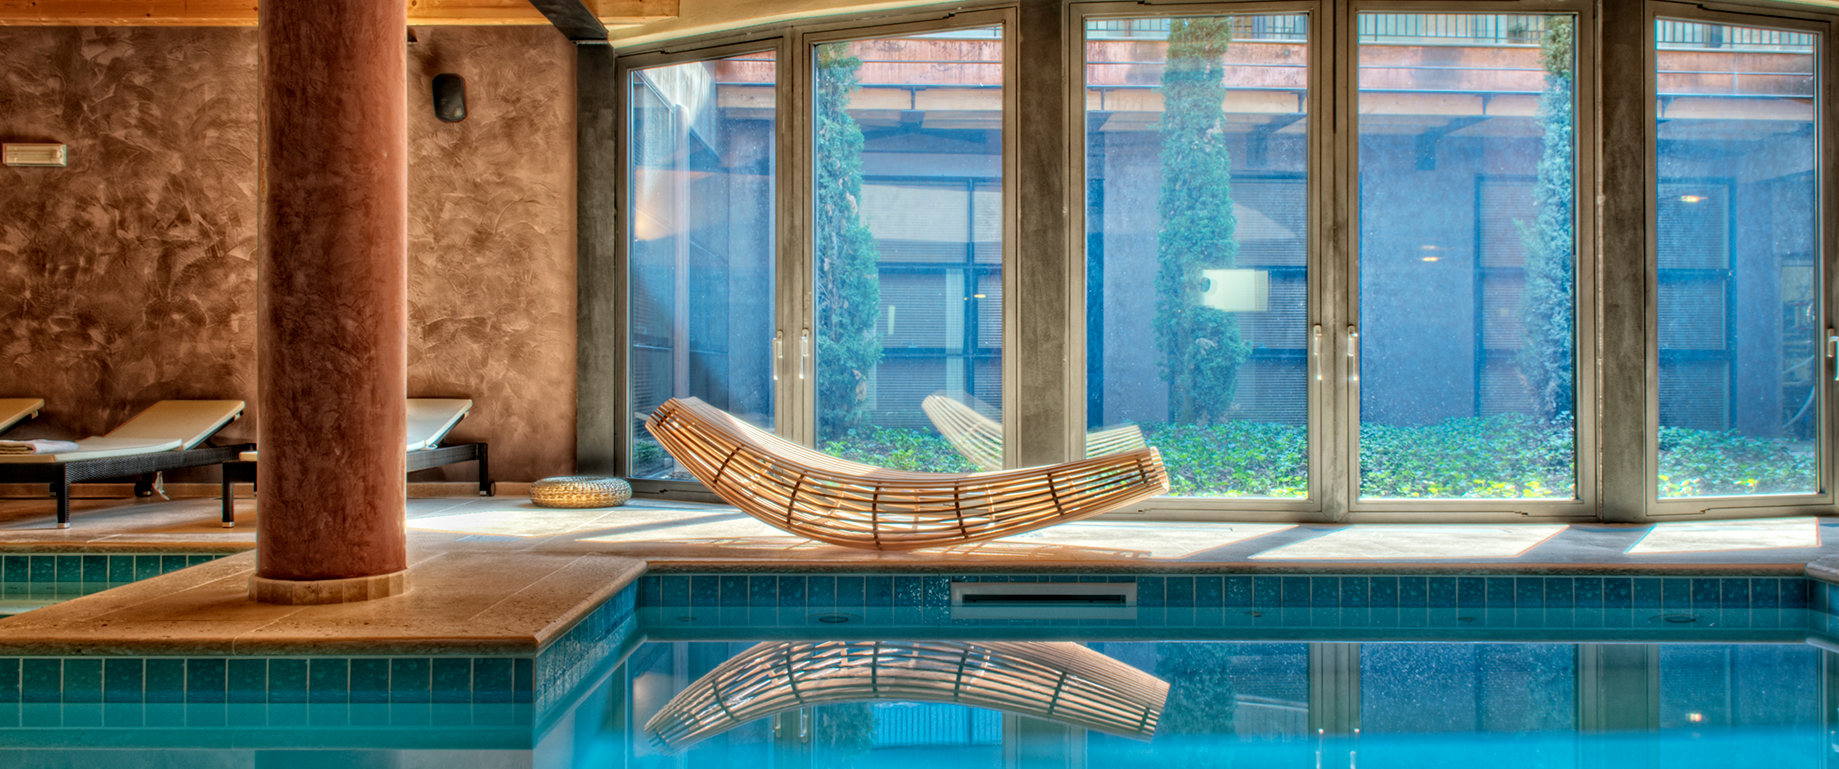 piscina-verona